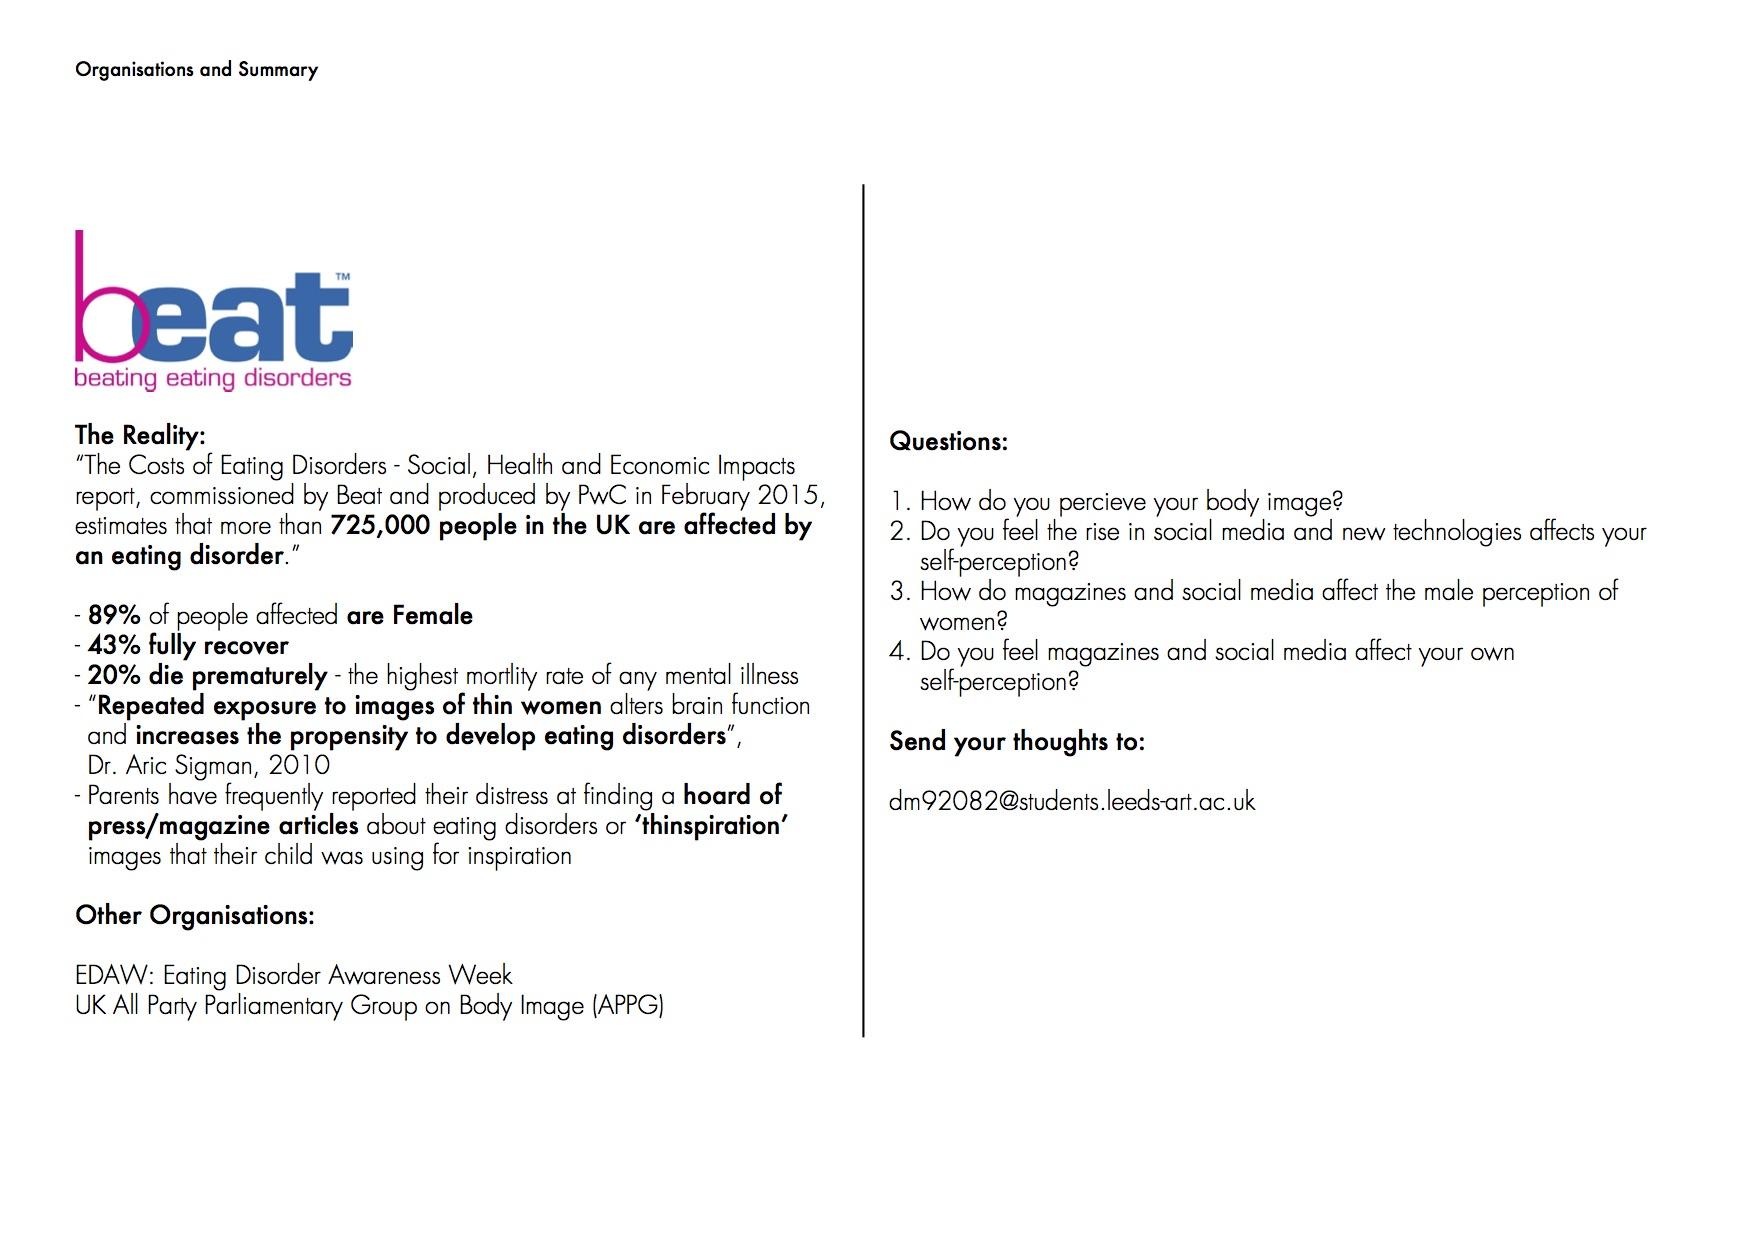 danielle-muntyan-oucp703-professional-practice-presentation-5